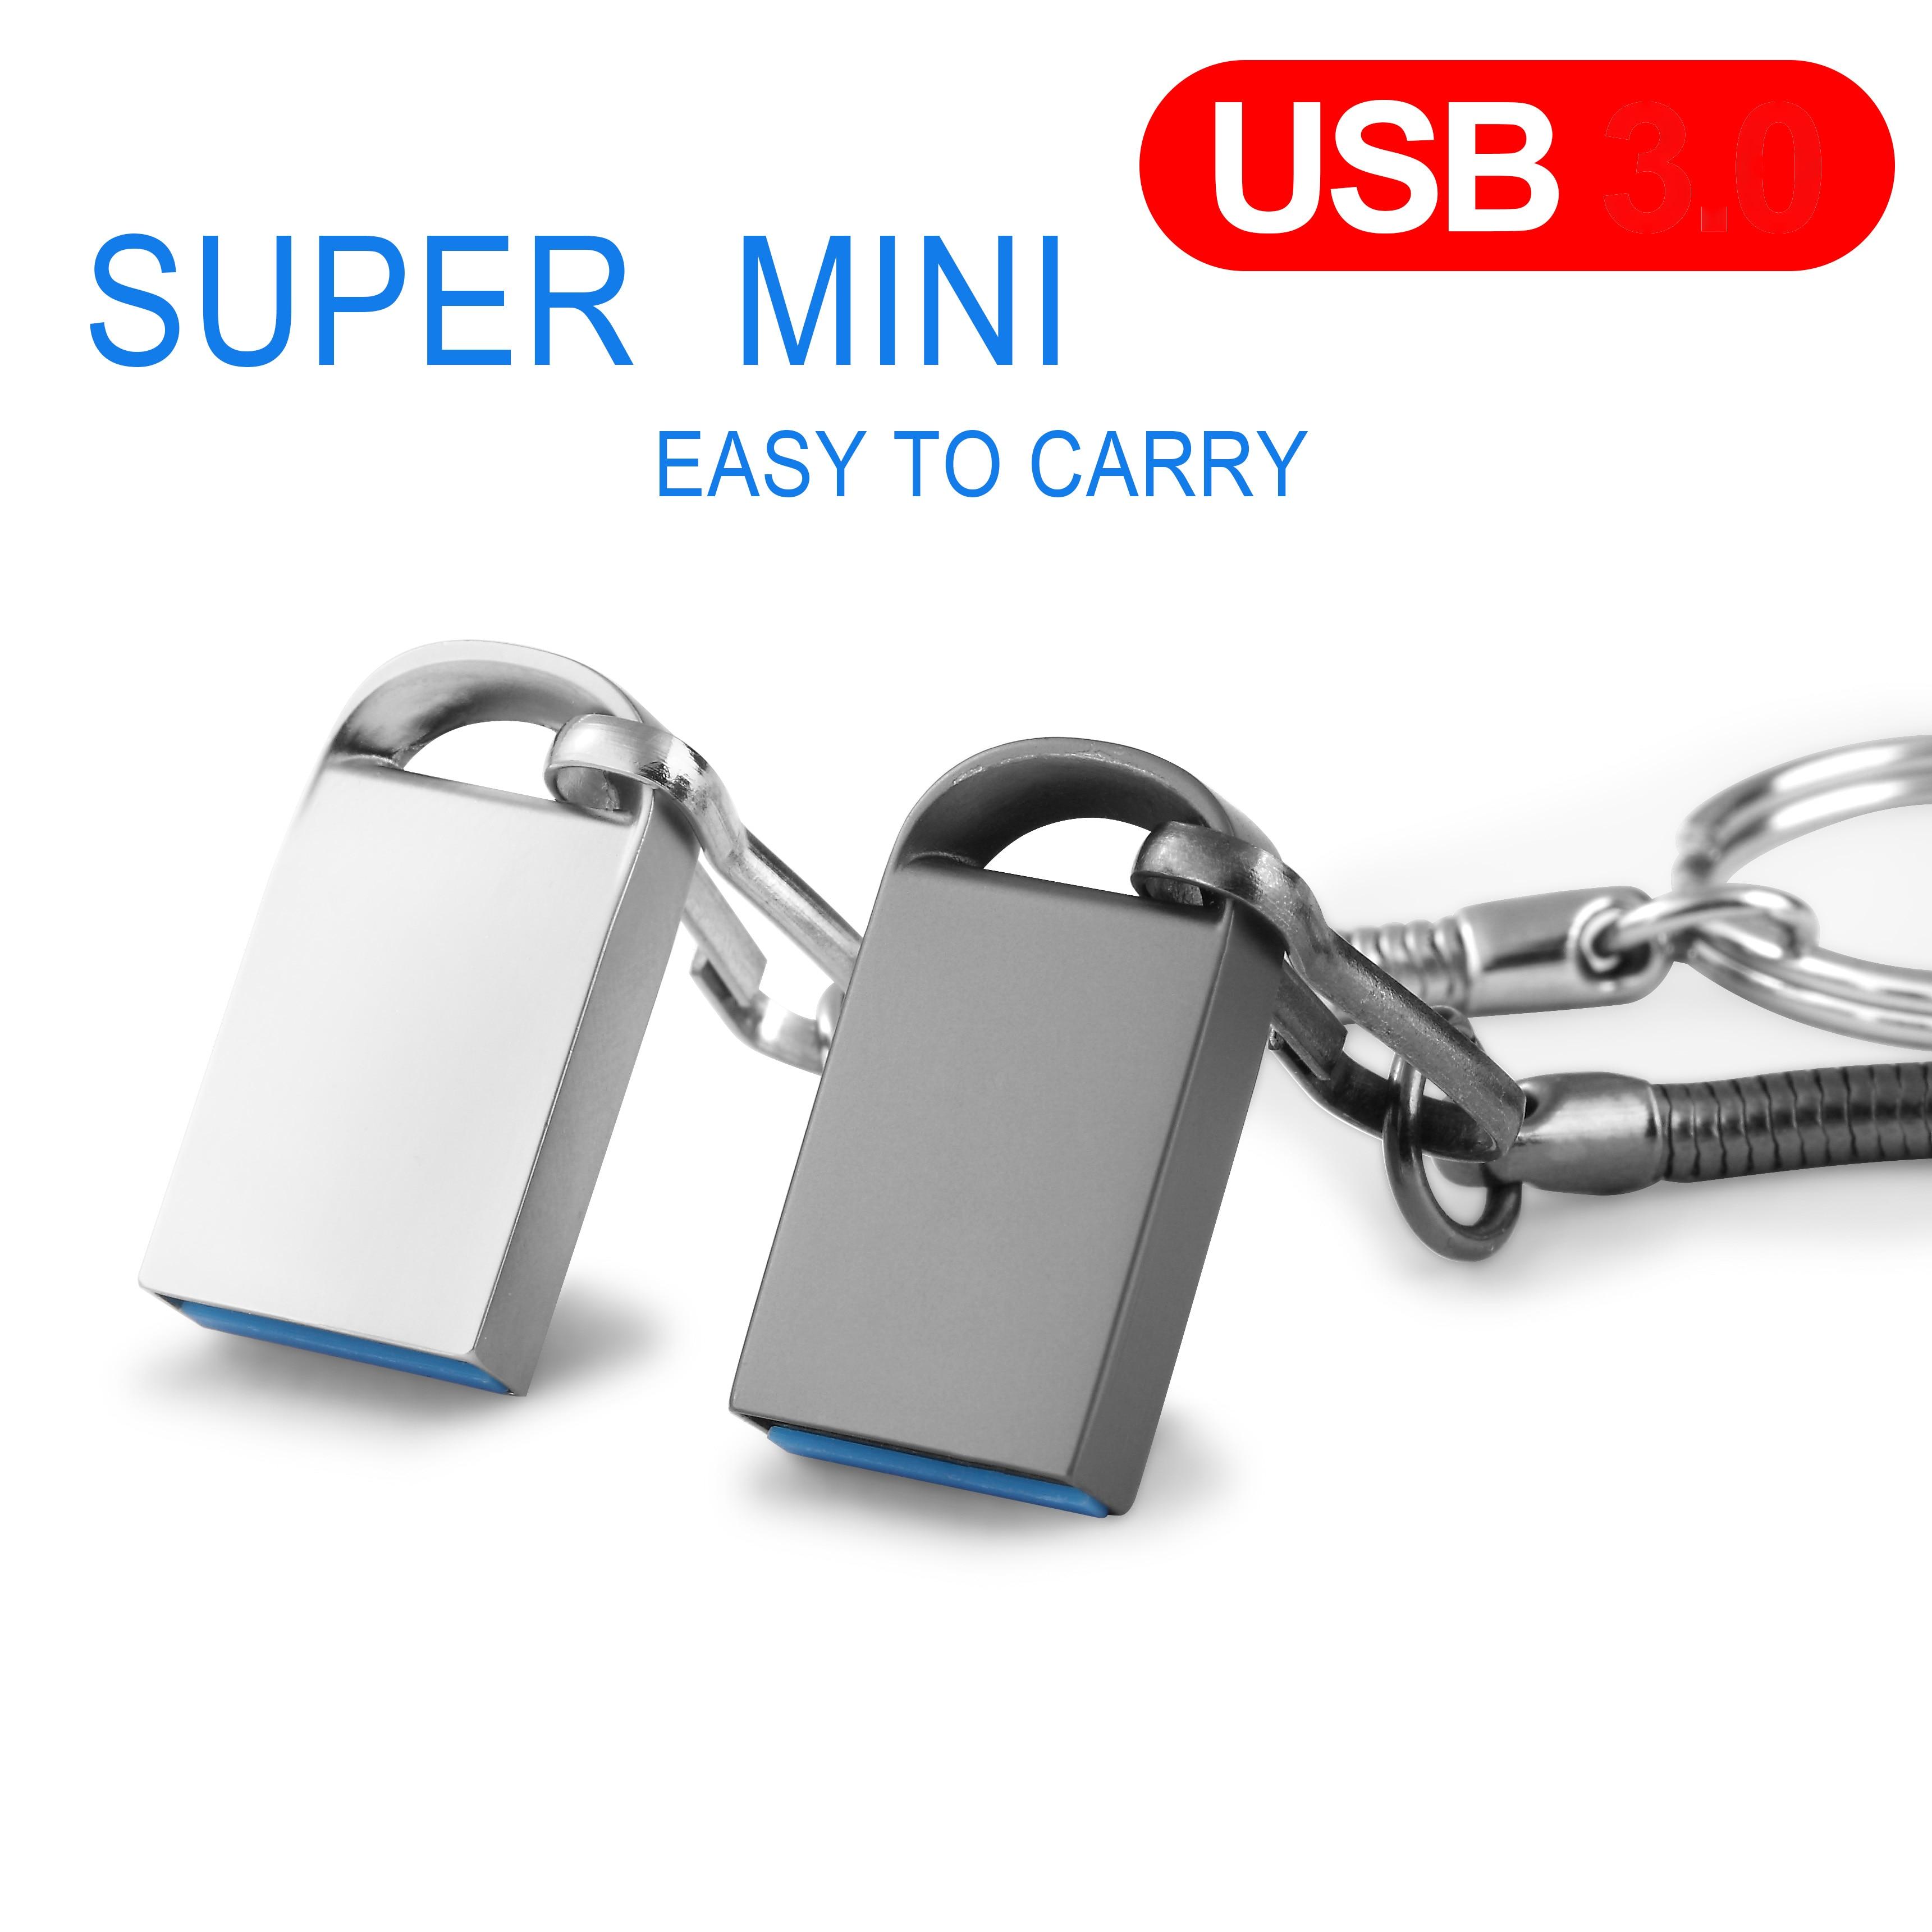 High Speed Pen Drive 64GB Pendrive 128GB USB Flash Drive 32GB Cle Usb Memory 16GB Flash USB Stick And Free Micro Type-c Adapter